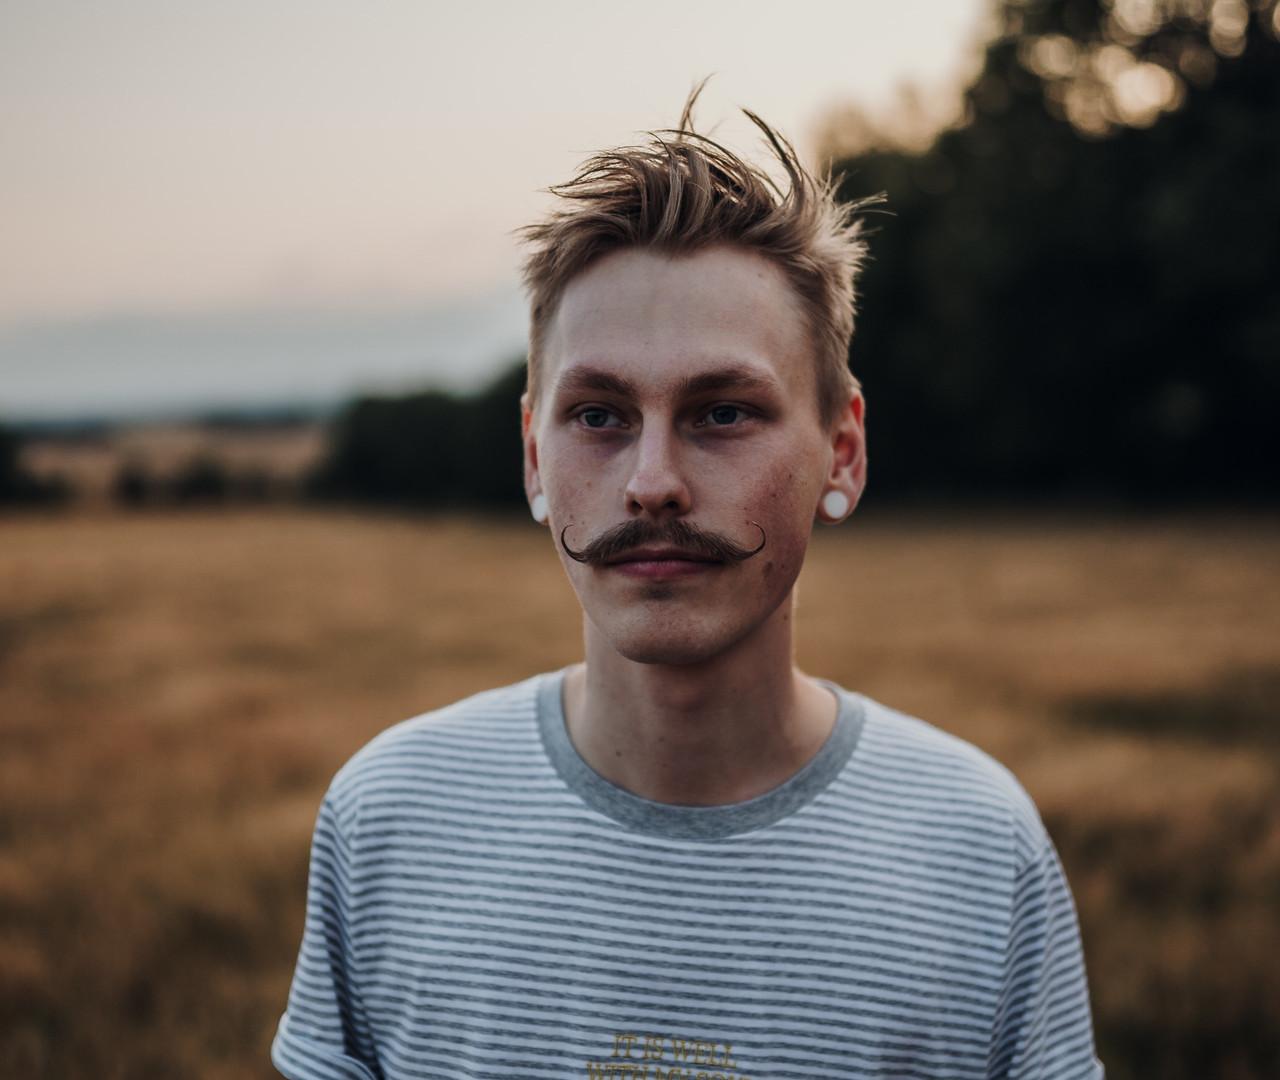 bigote manillar.jpg